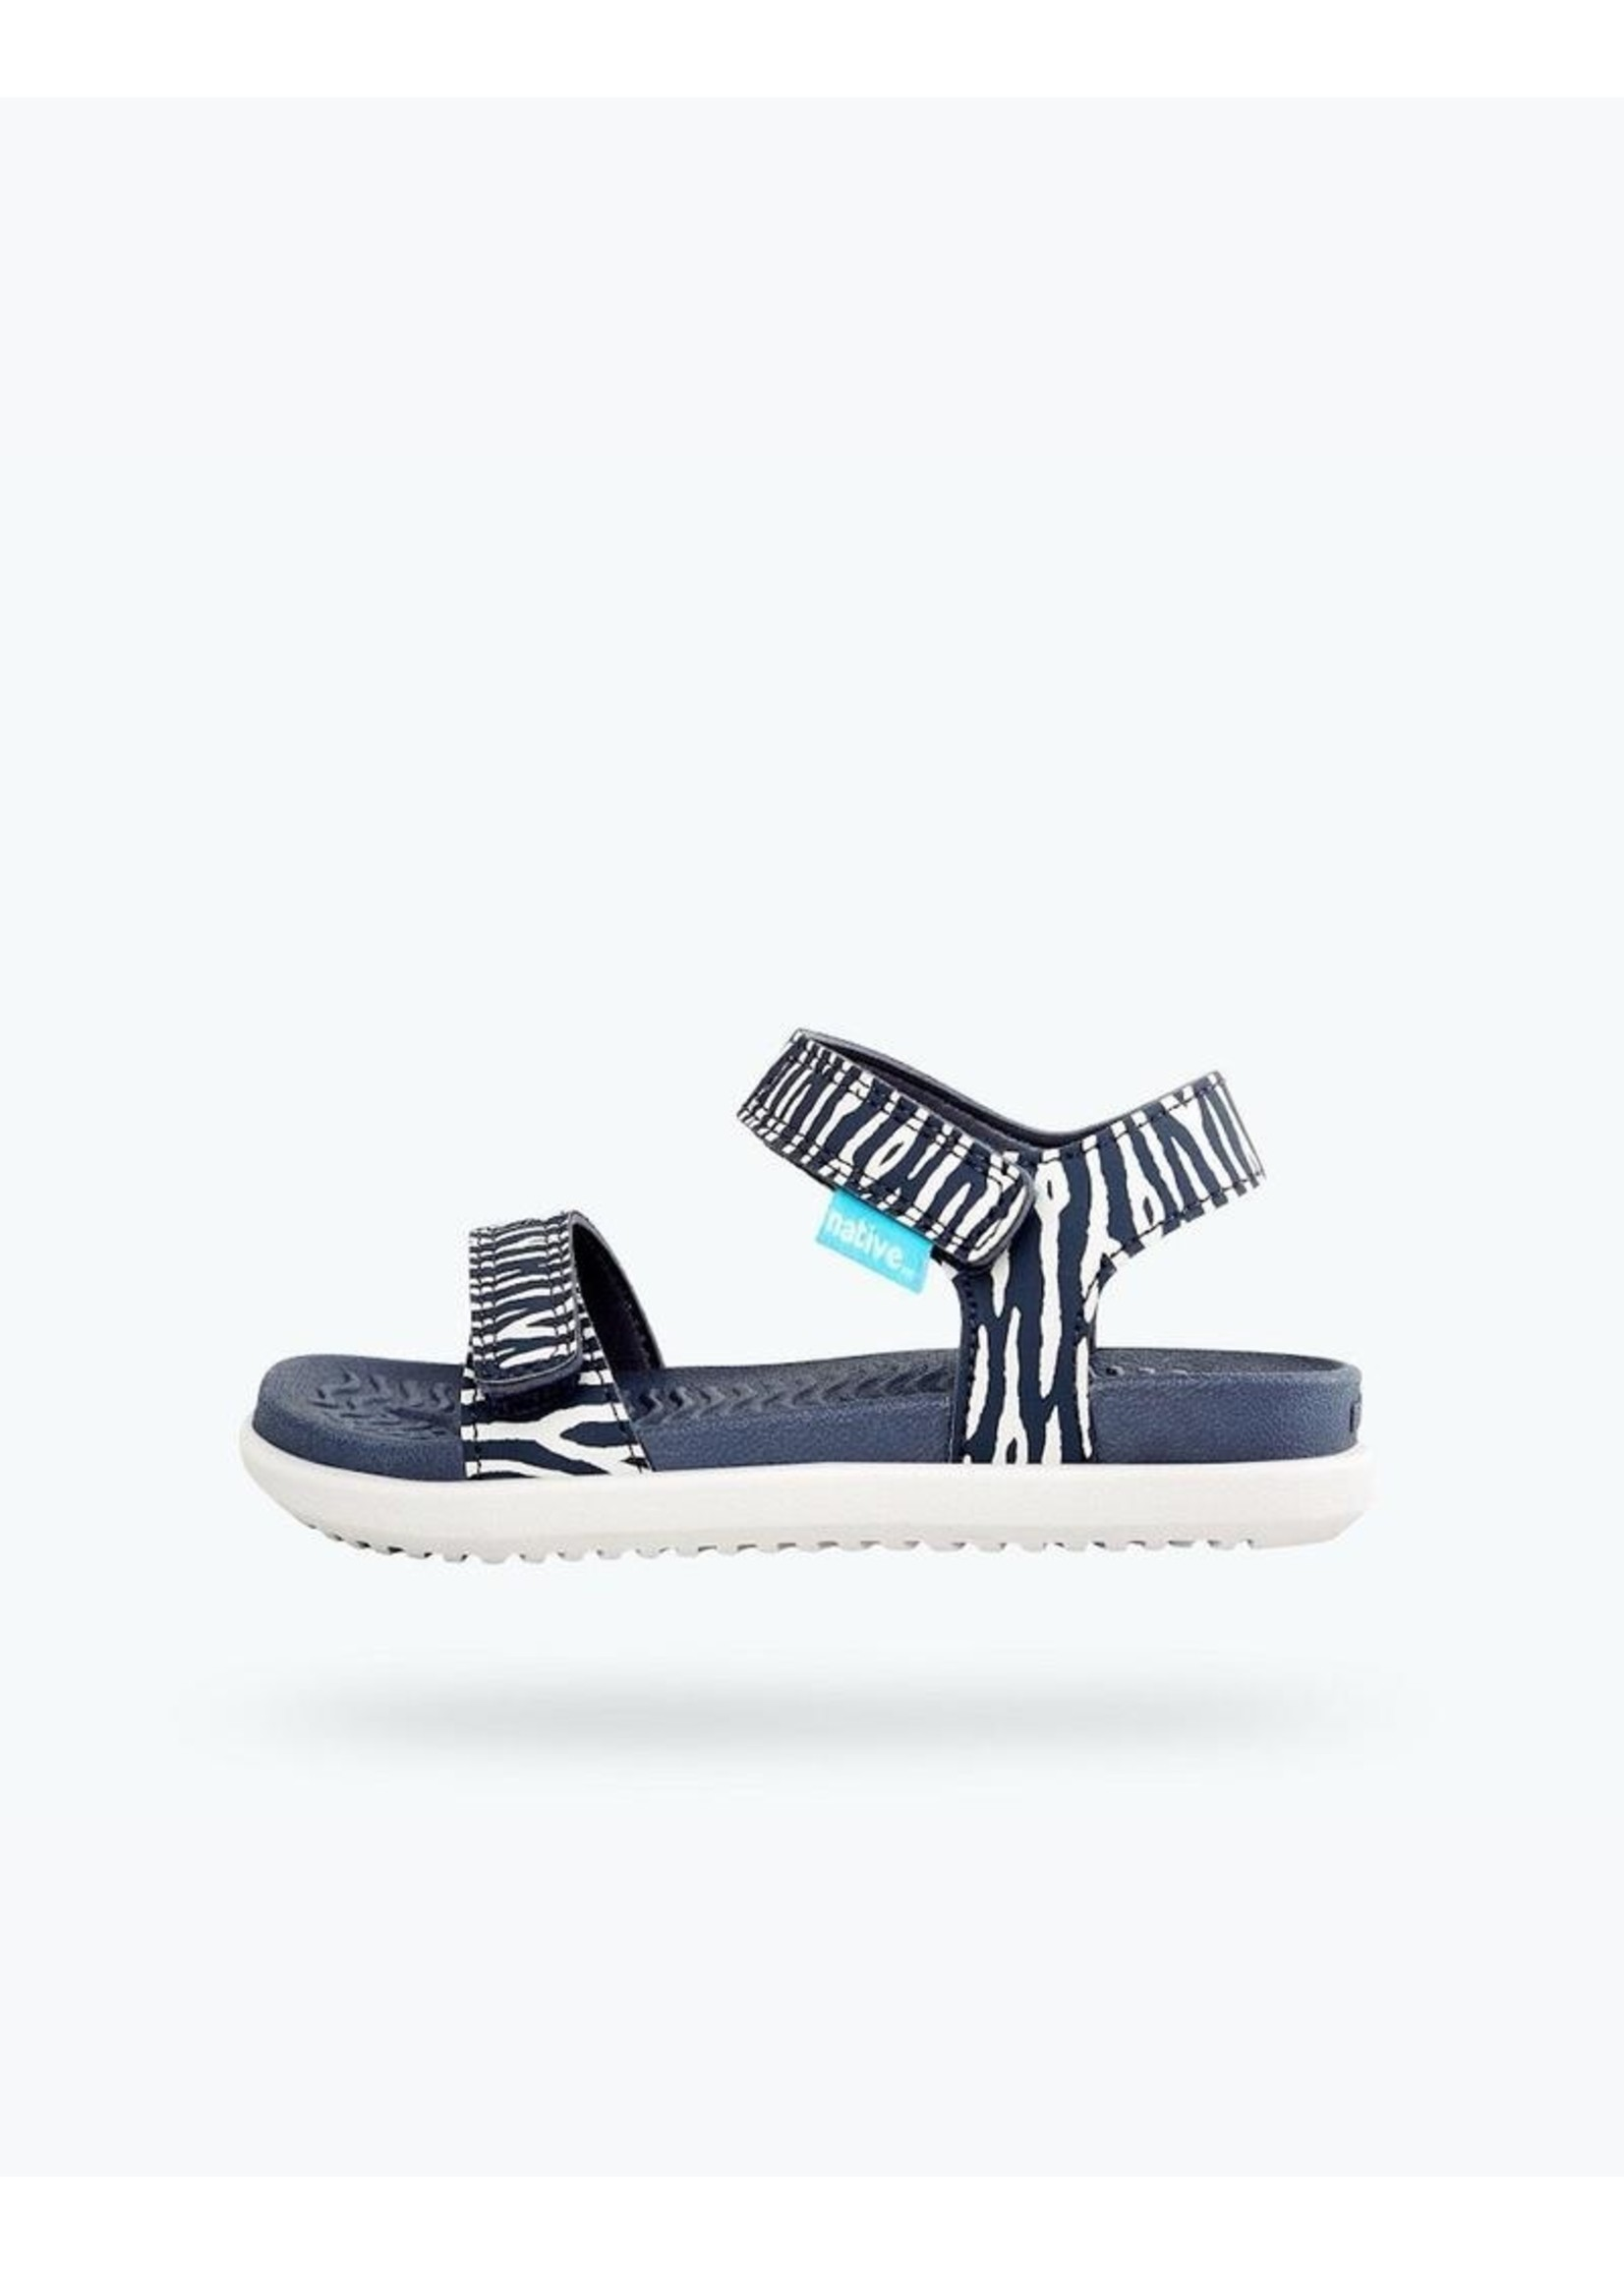 Native Shoes Native Shoes, Charley Print Youth in Darknite Grey/ Zinc Grey/ Zebra Cuddlefish